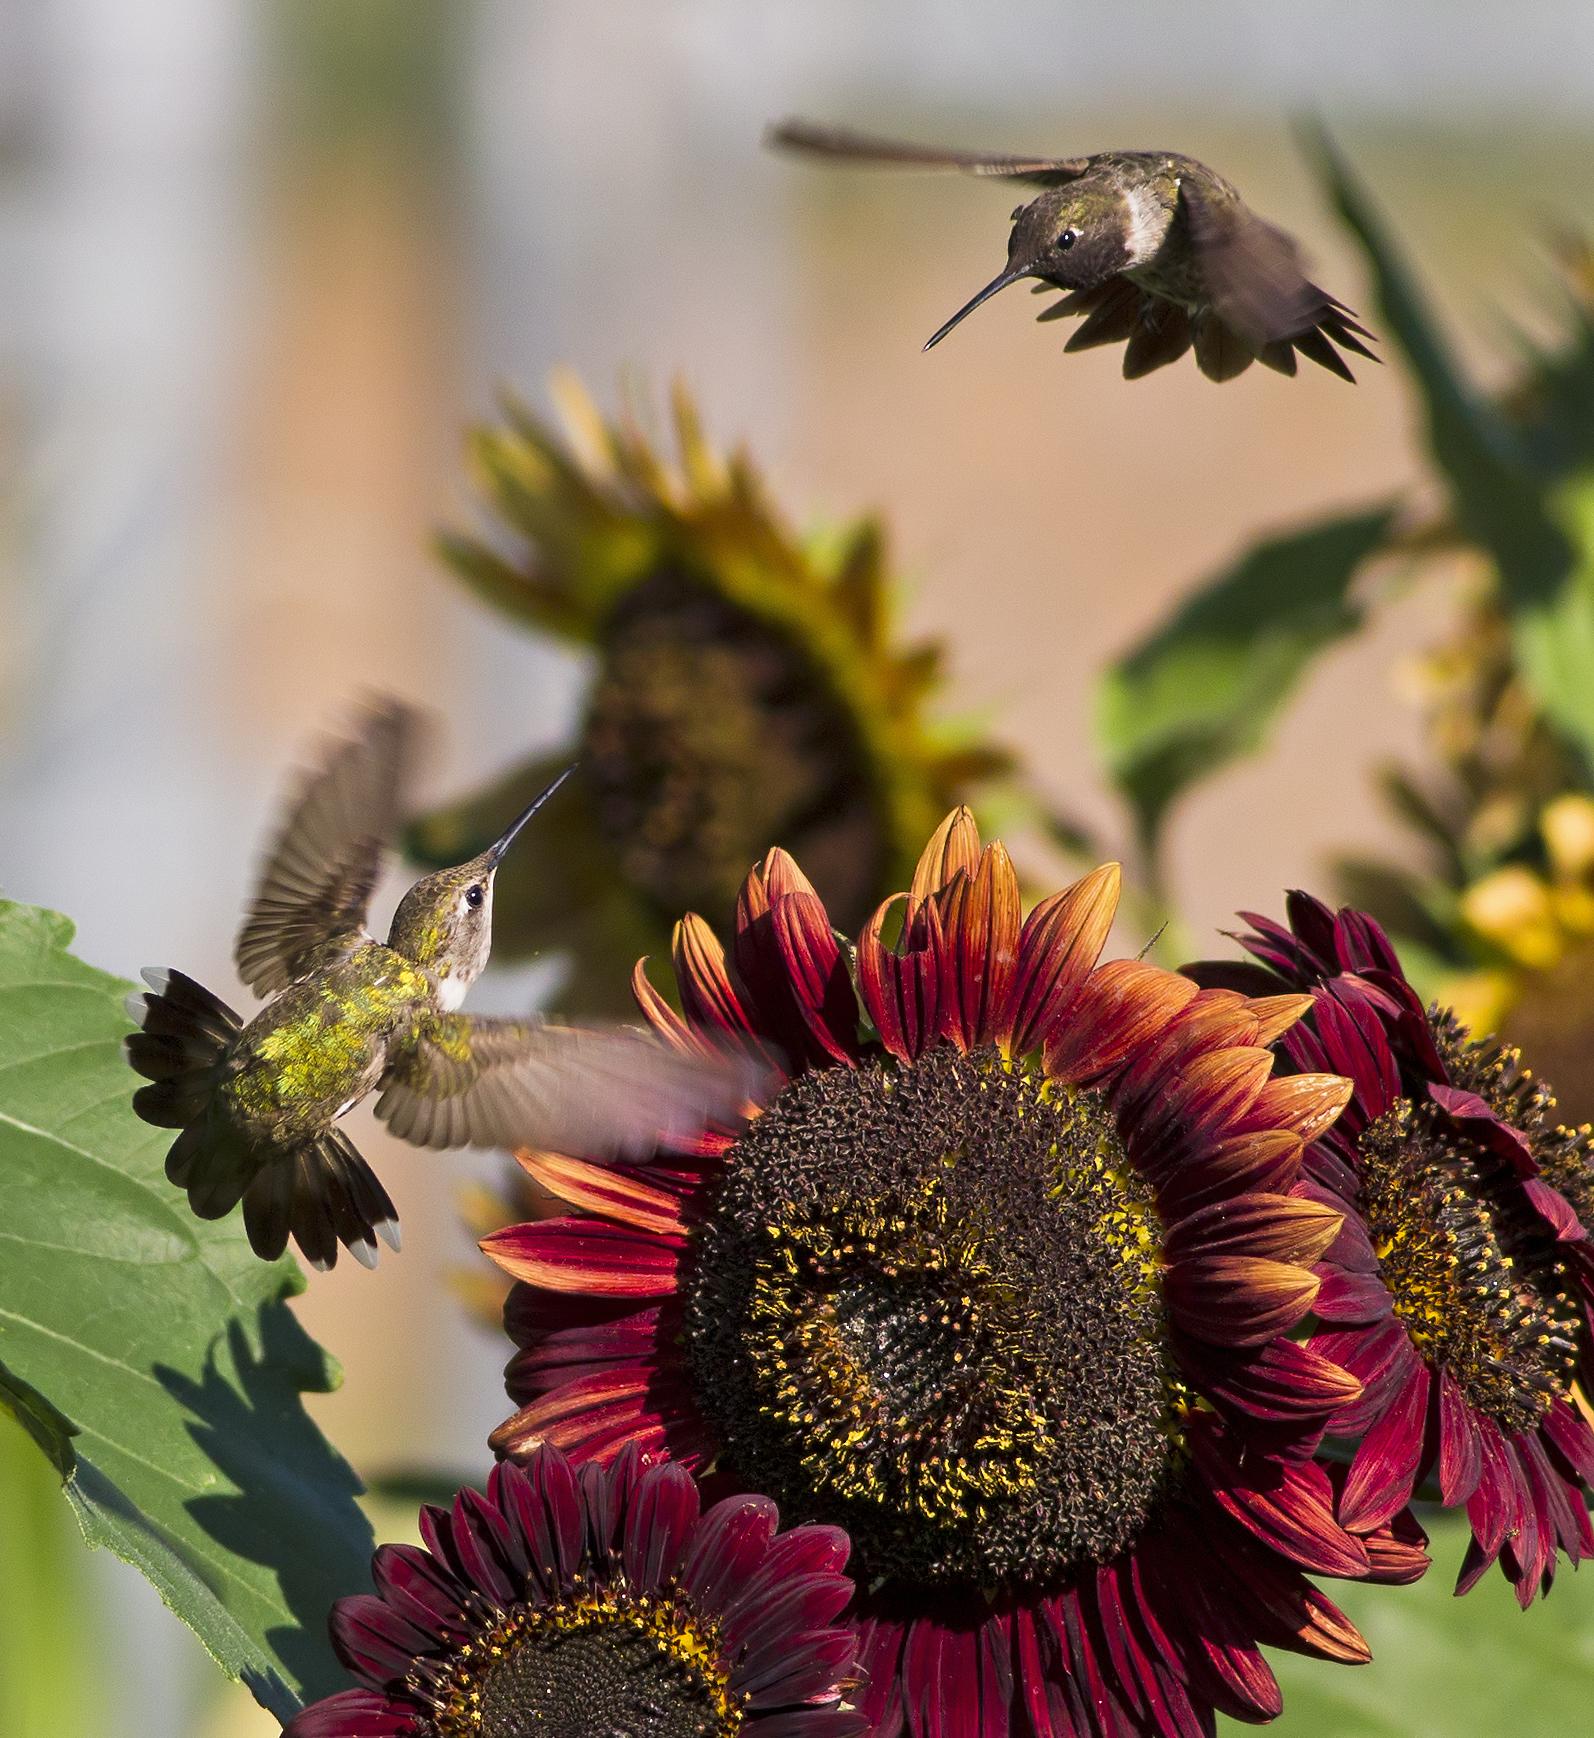 149 - Hummingbird